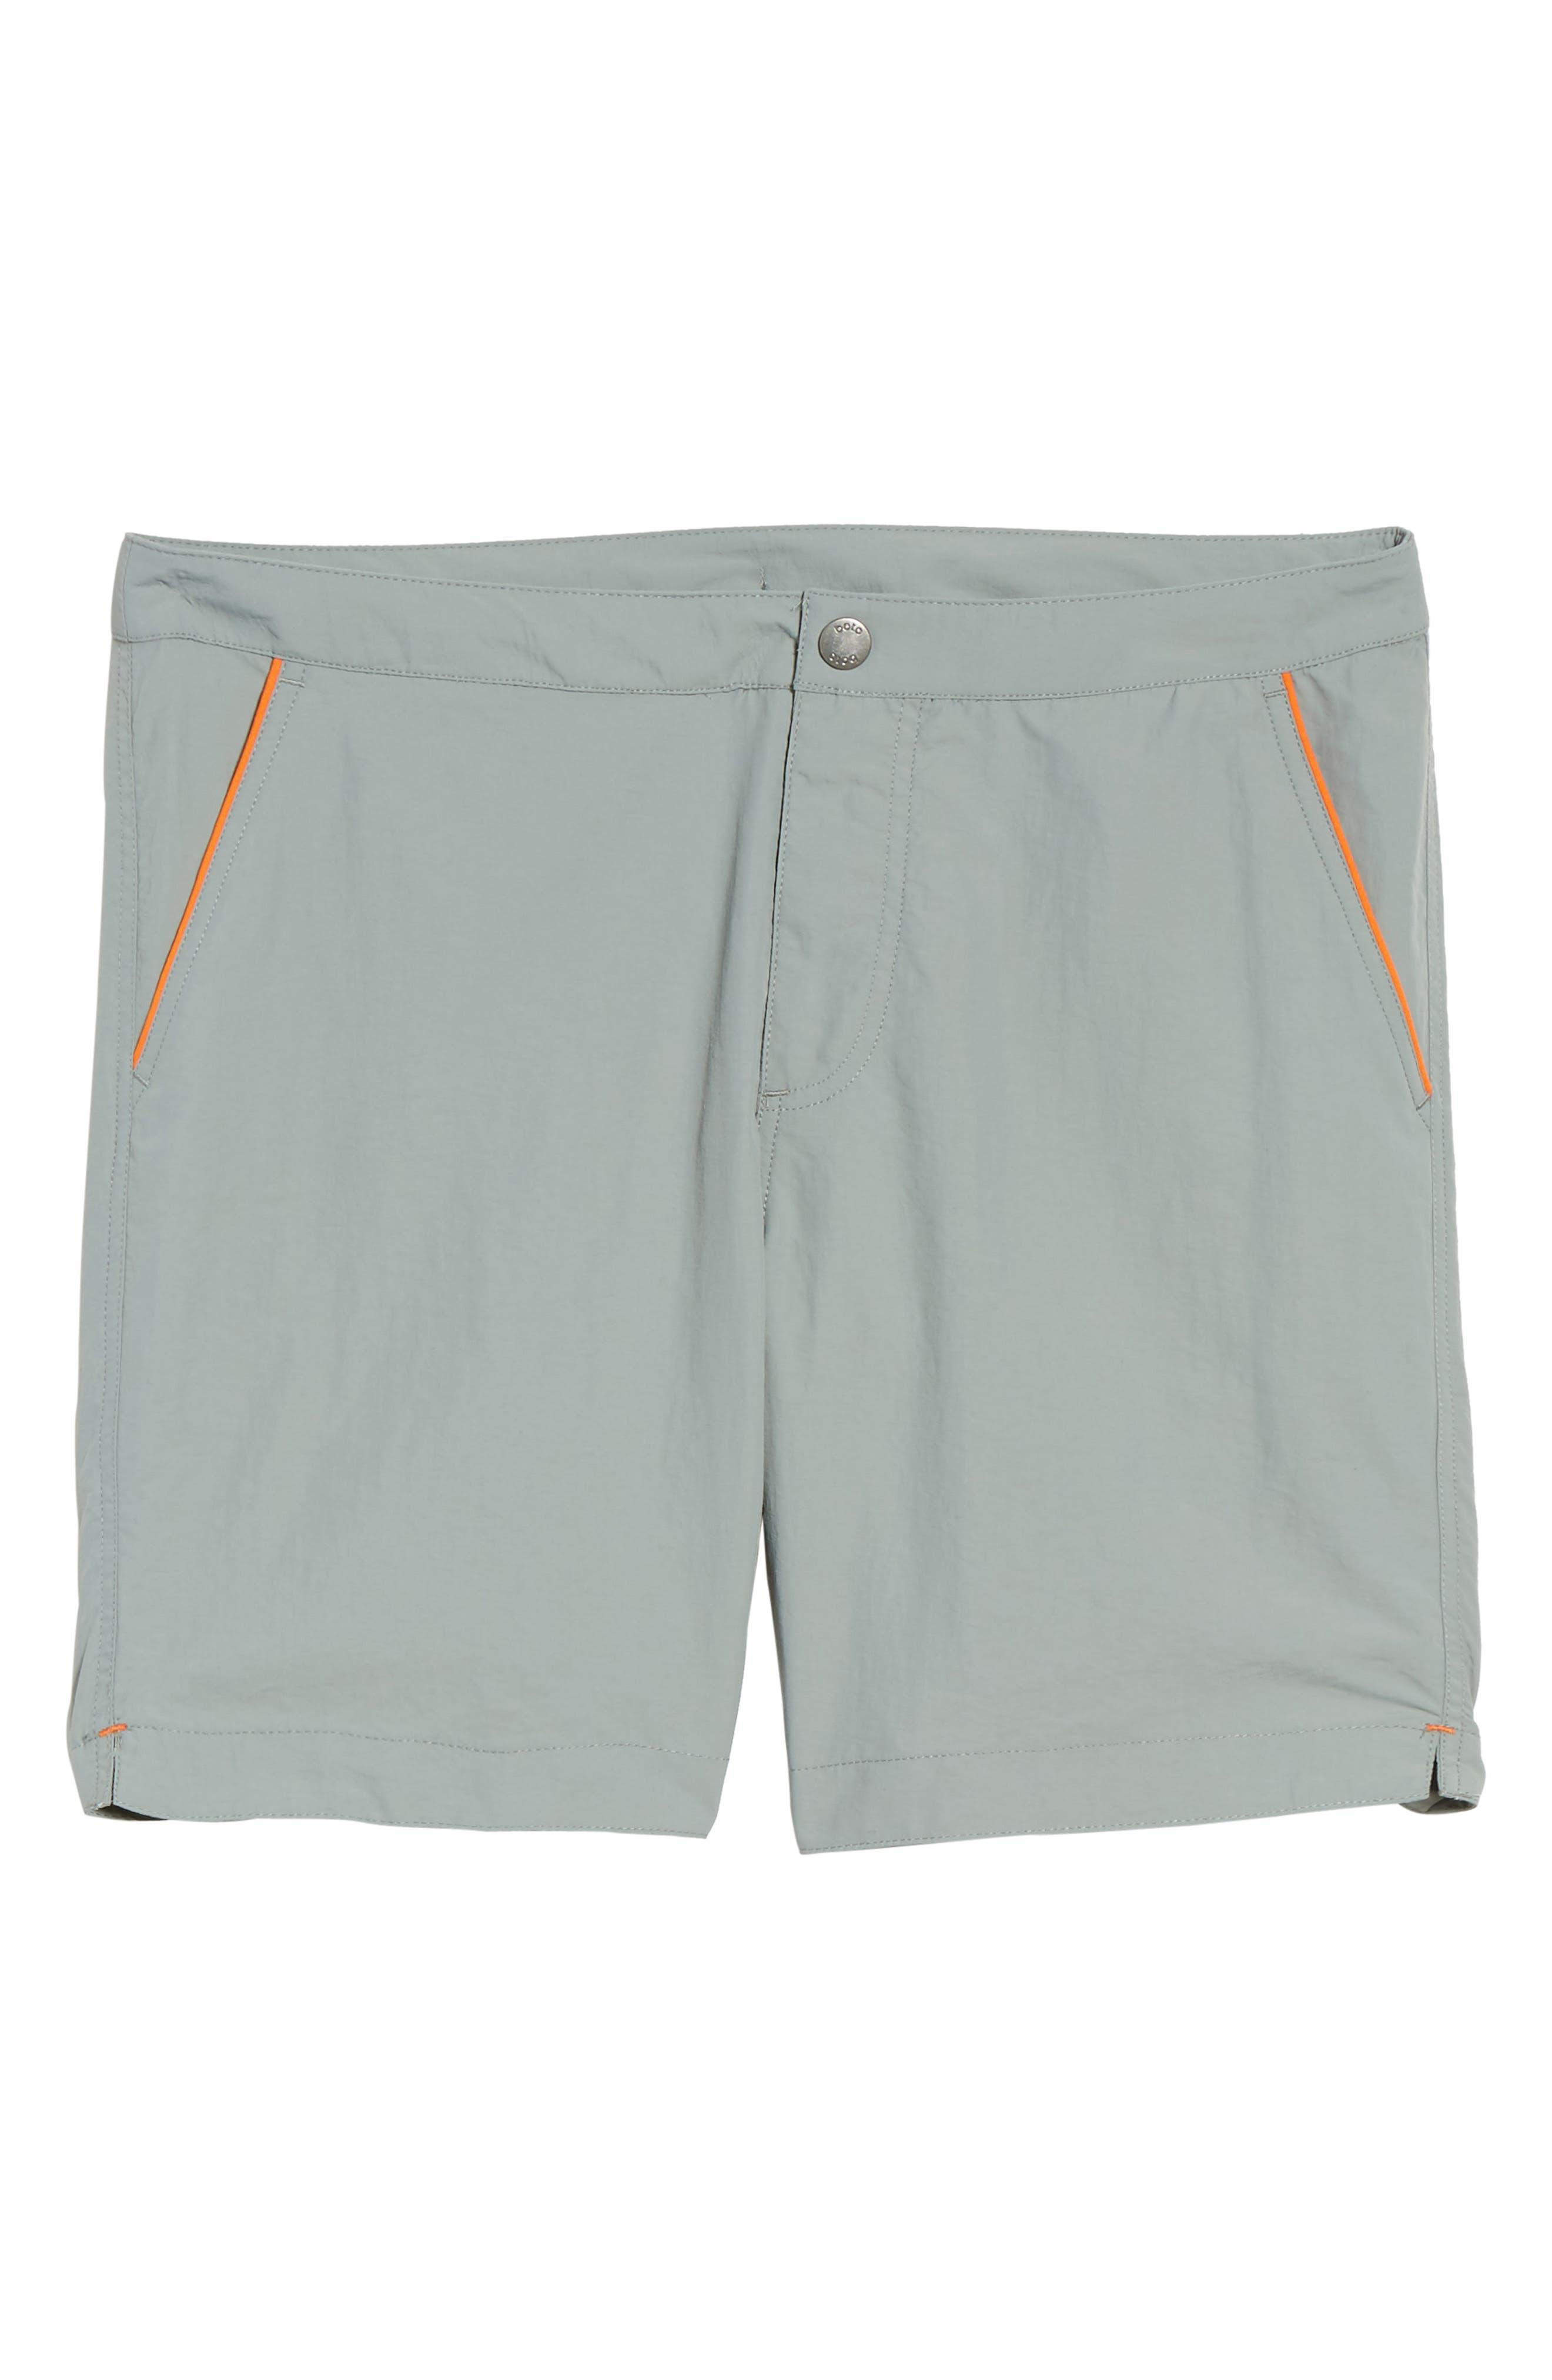 Rio Regular Fit Swim Trunks,                             Alternate thumbnail 6, color,                             Grey Solid